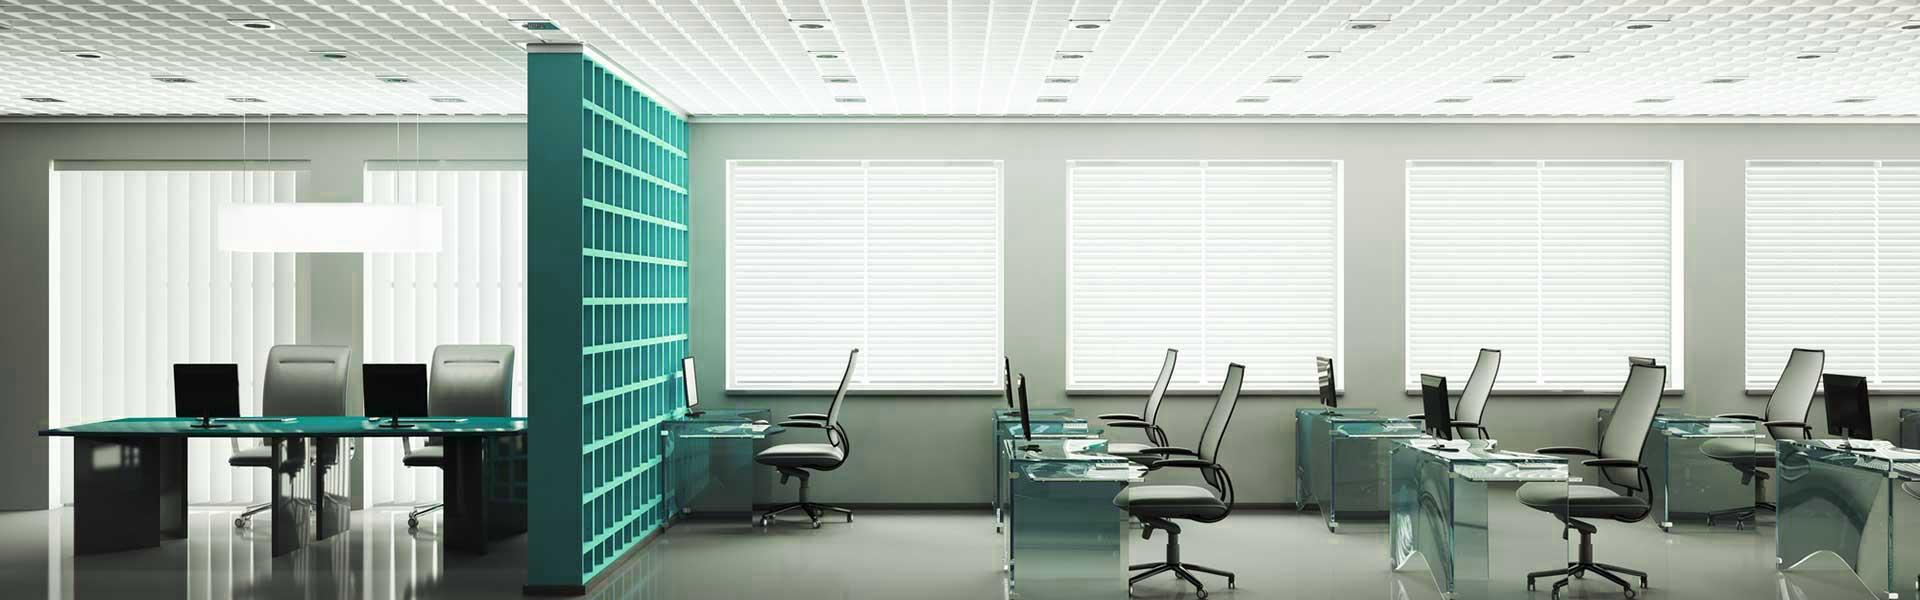 Office Furniture in Bradford